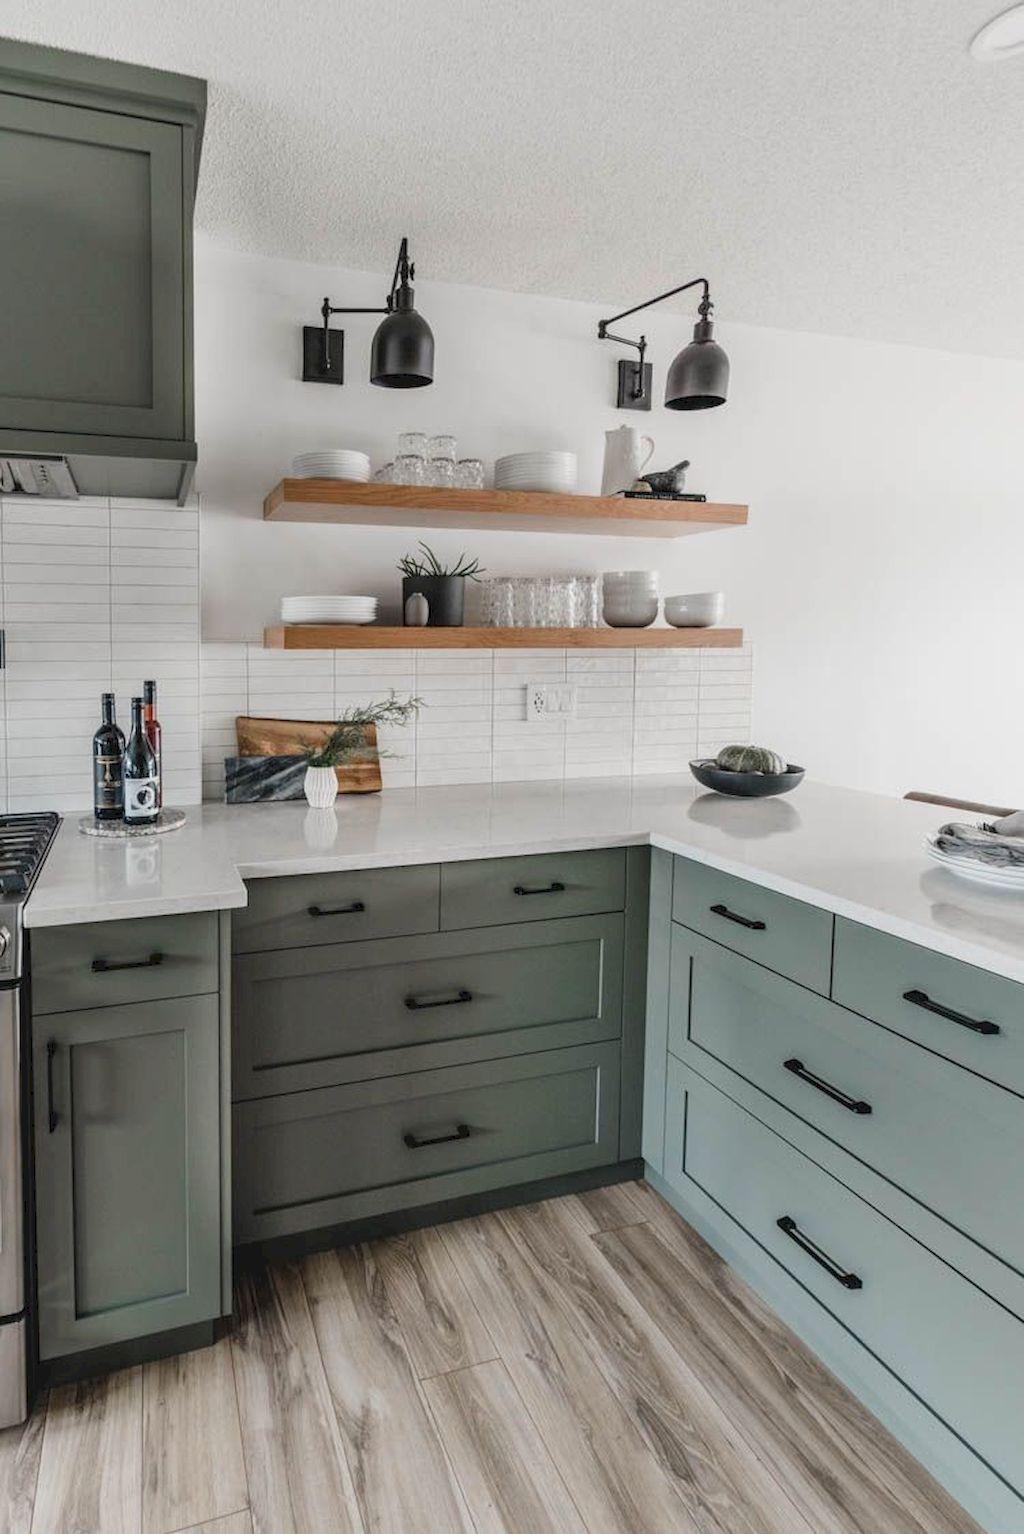 70 Brilliant Kitchen Cabinet Organization And Tips Ideas